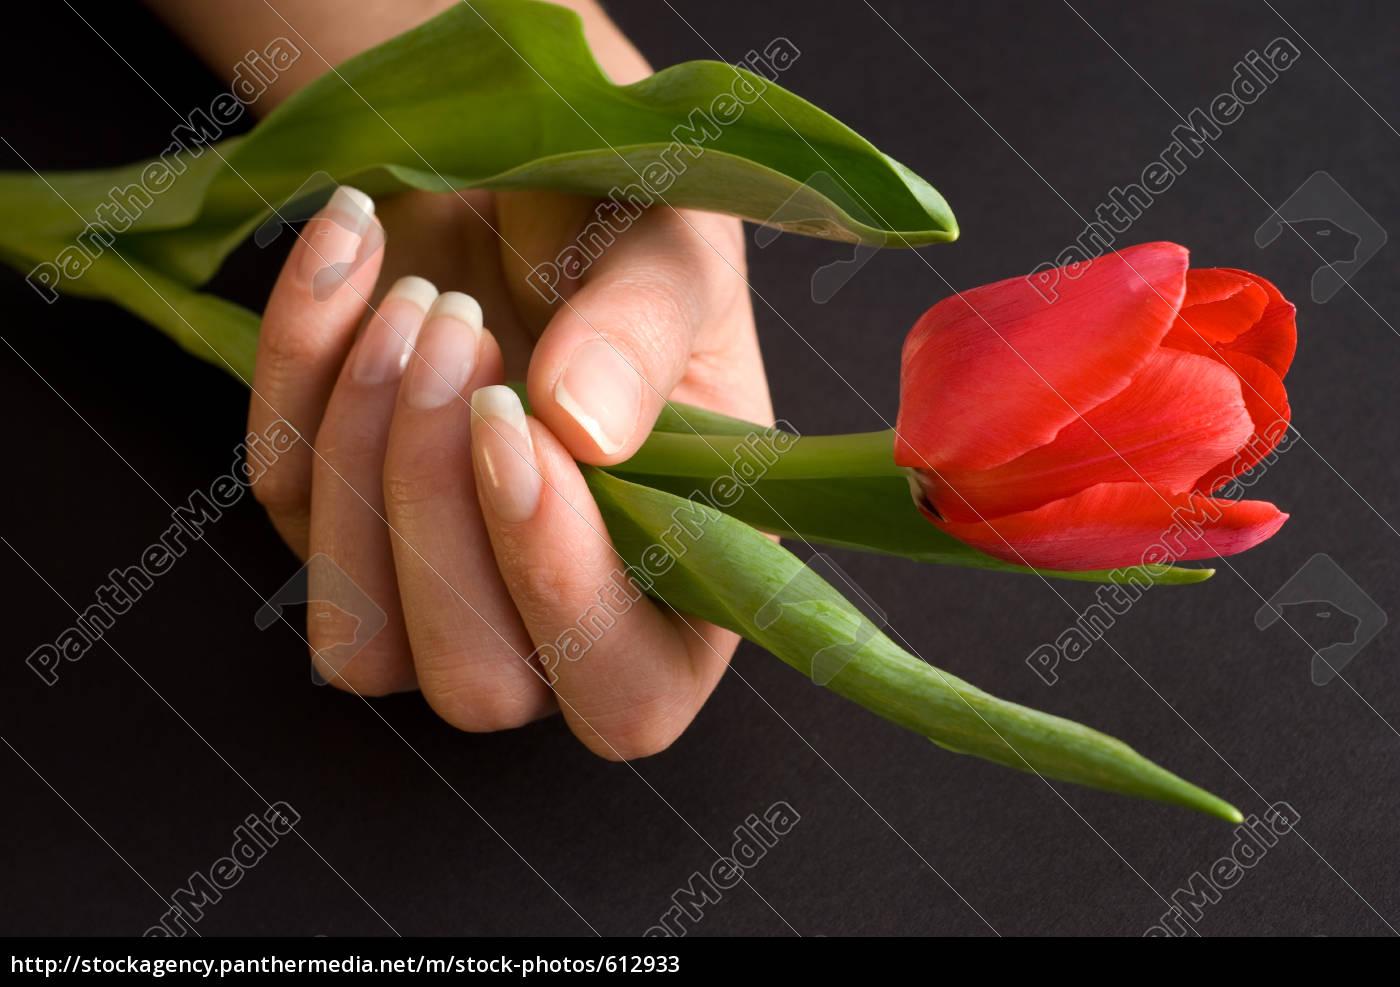 woman's, hand - 612933